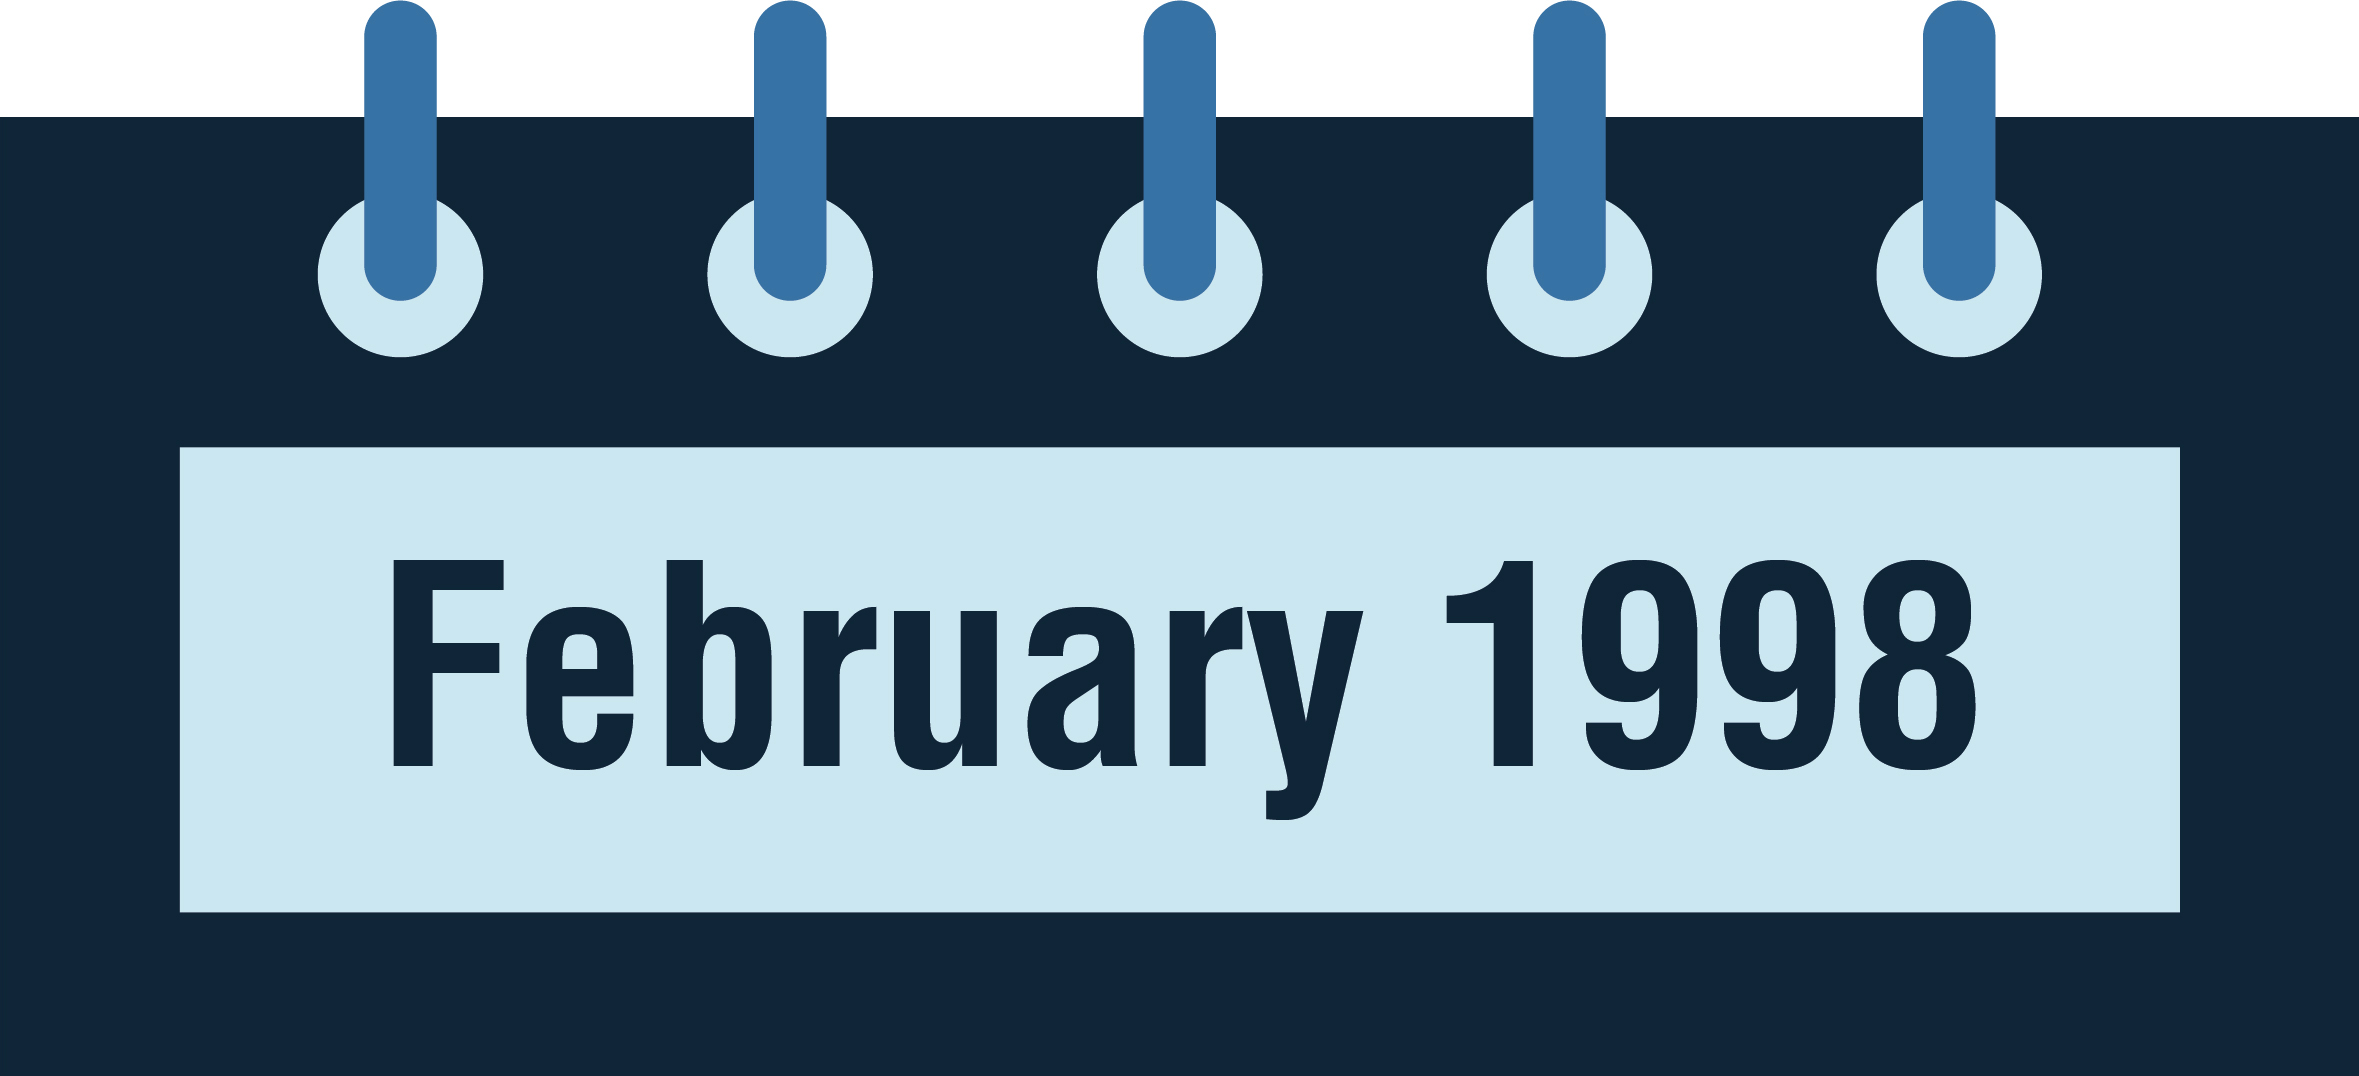 NeuroCheck History - February 1998 (Image © NeuroCheck)